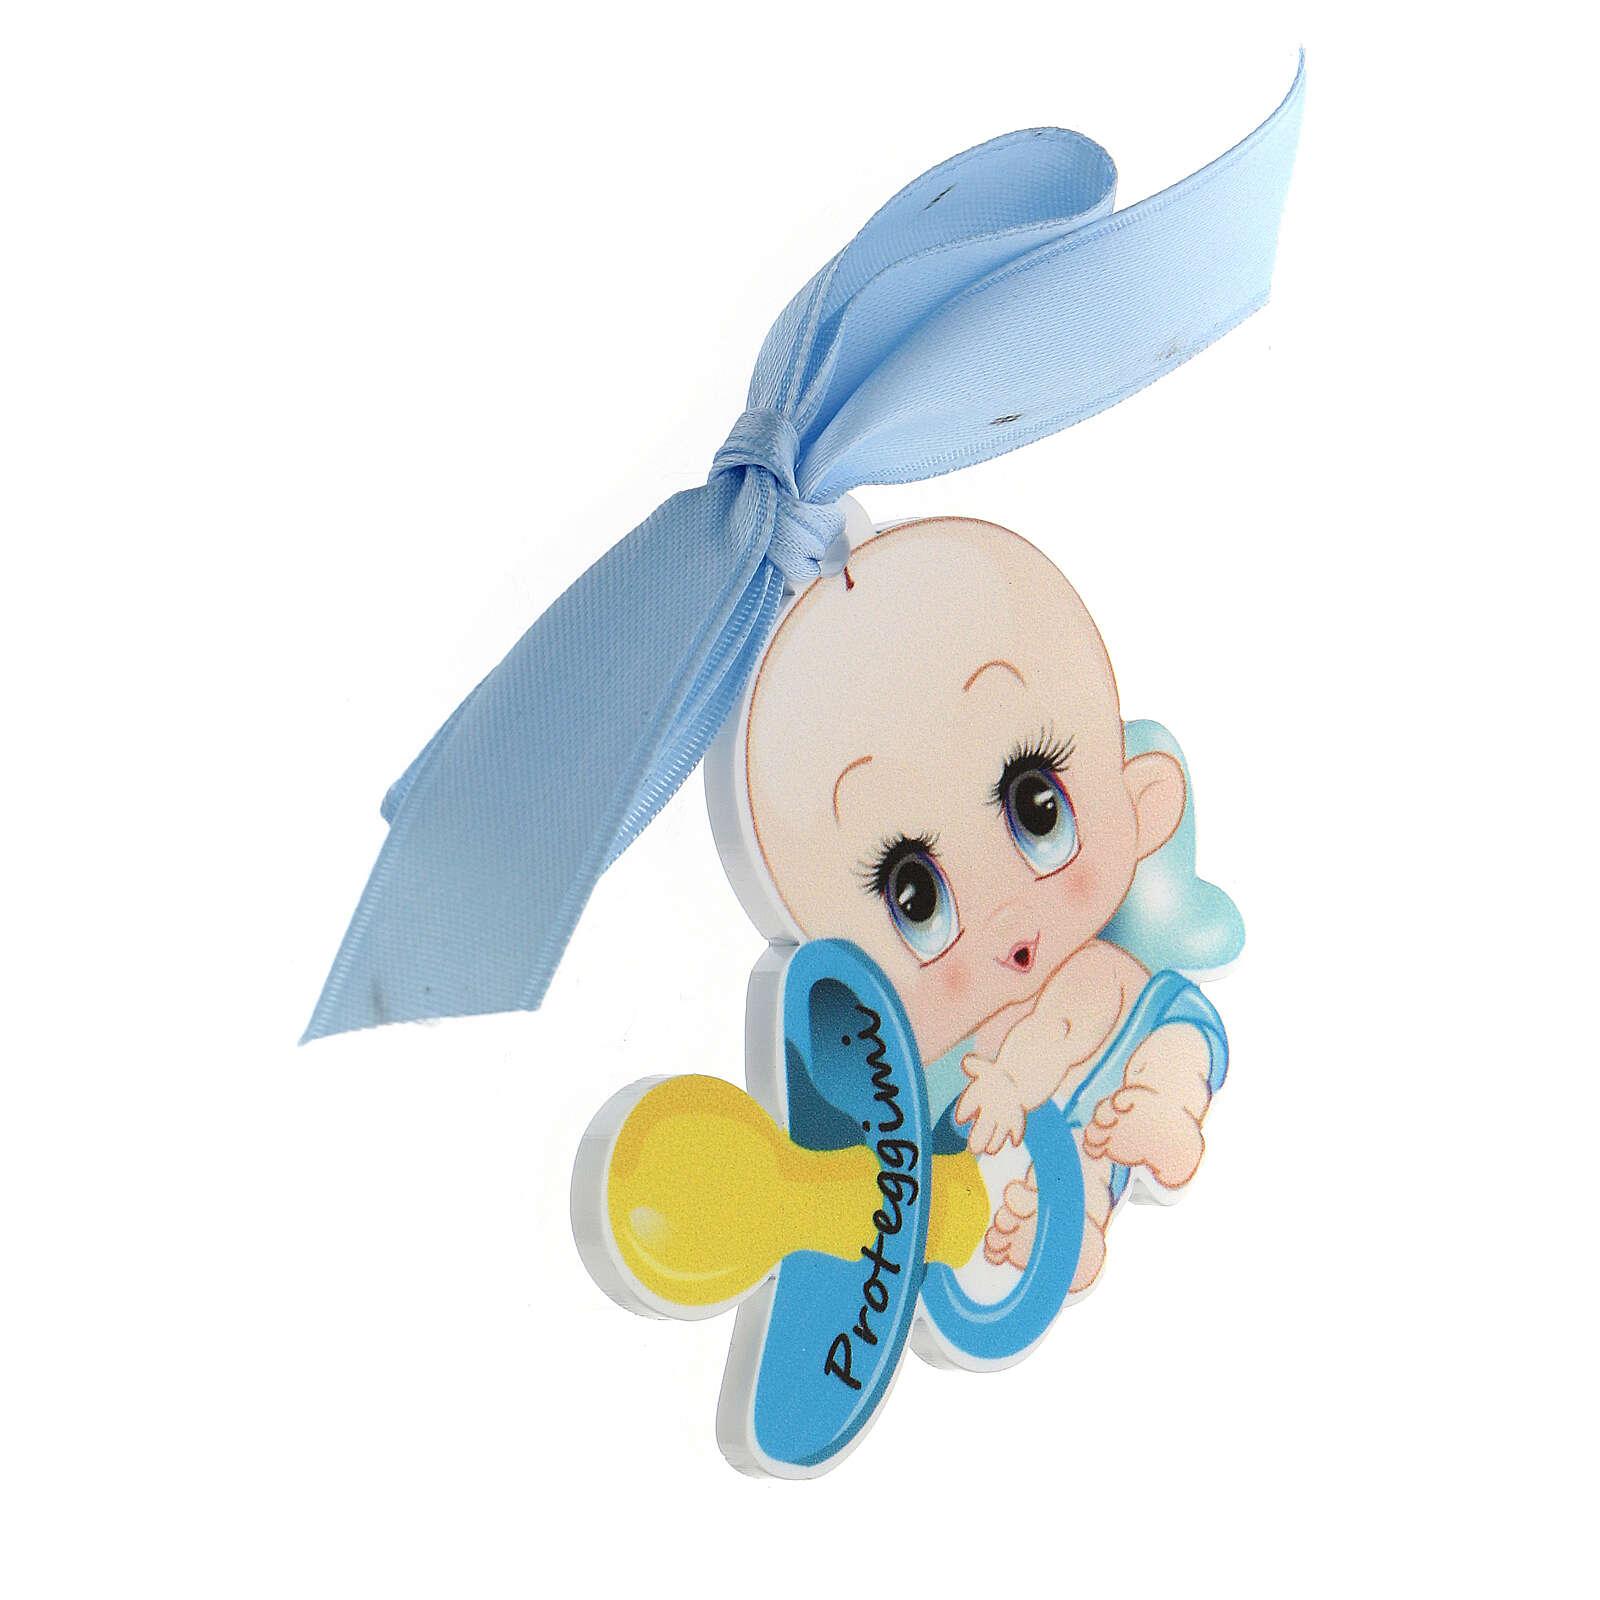 Medalla para cuna niño escrita Proteggimi moño 4